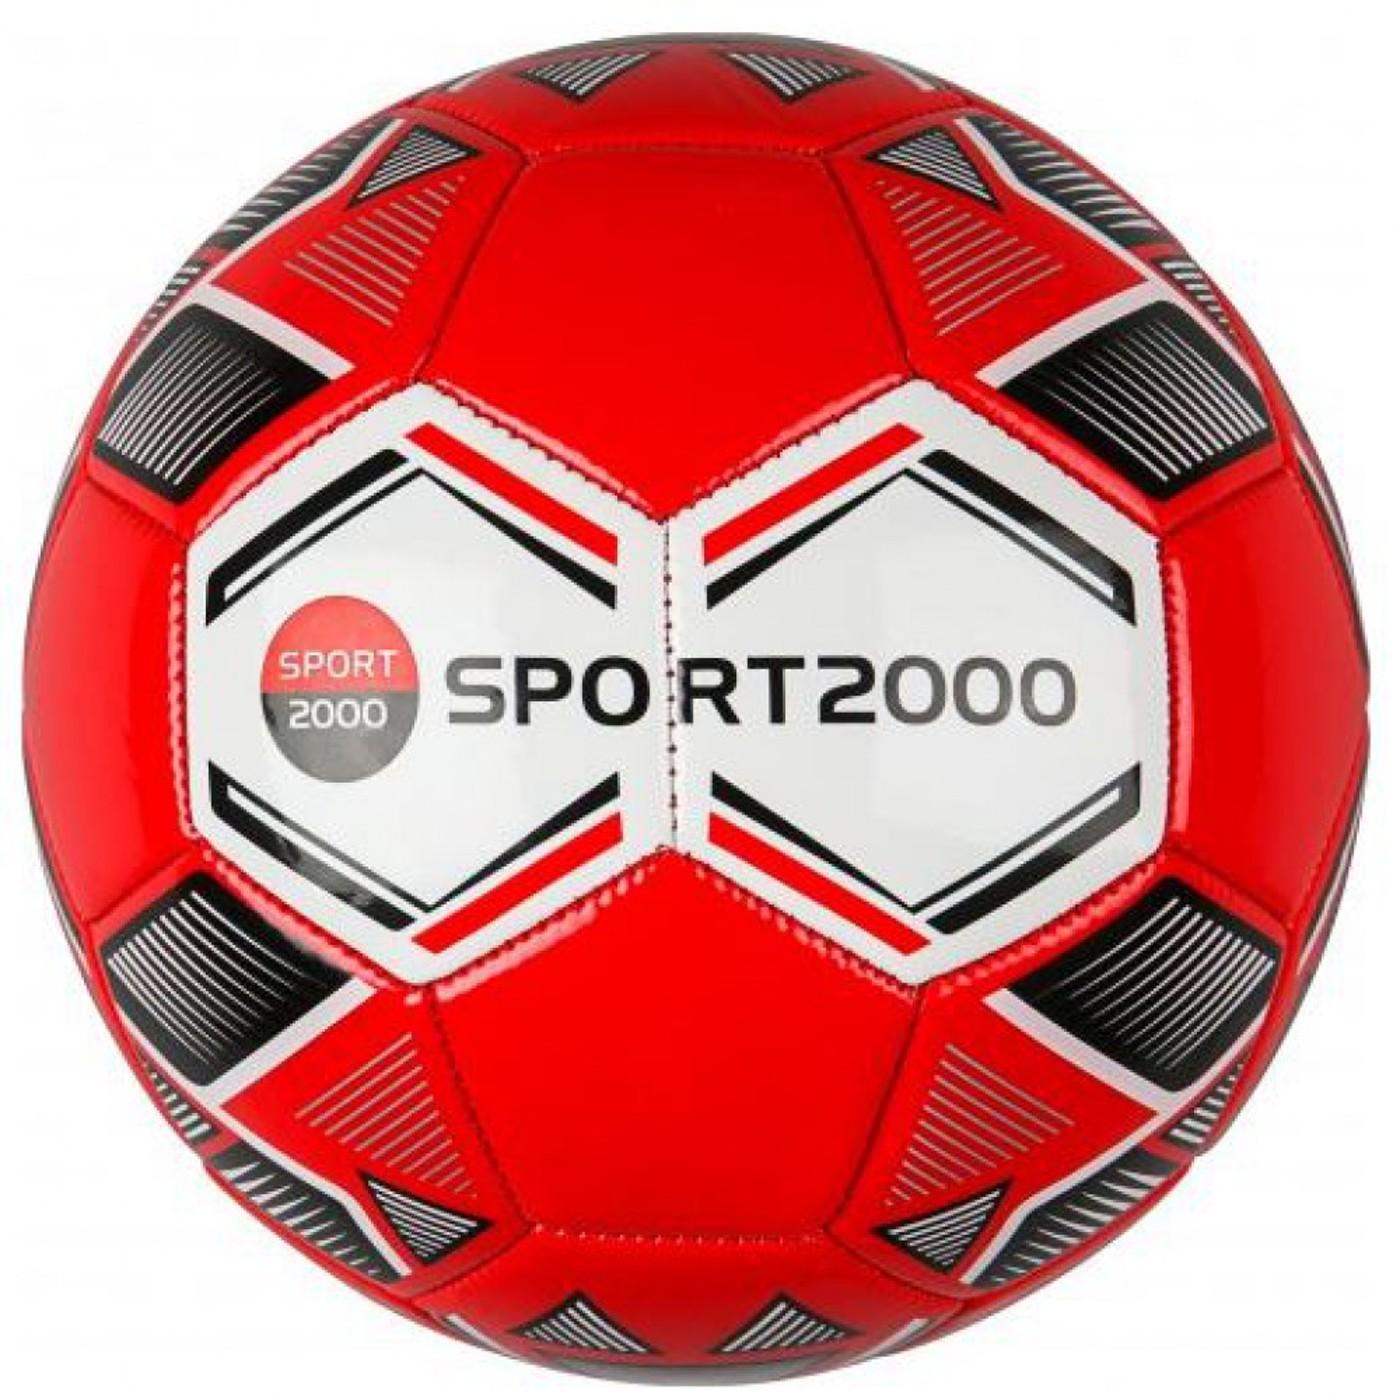 SPORT 2000 PROMO